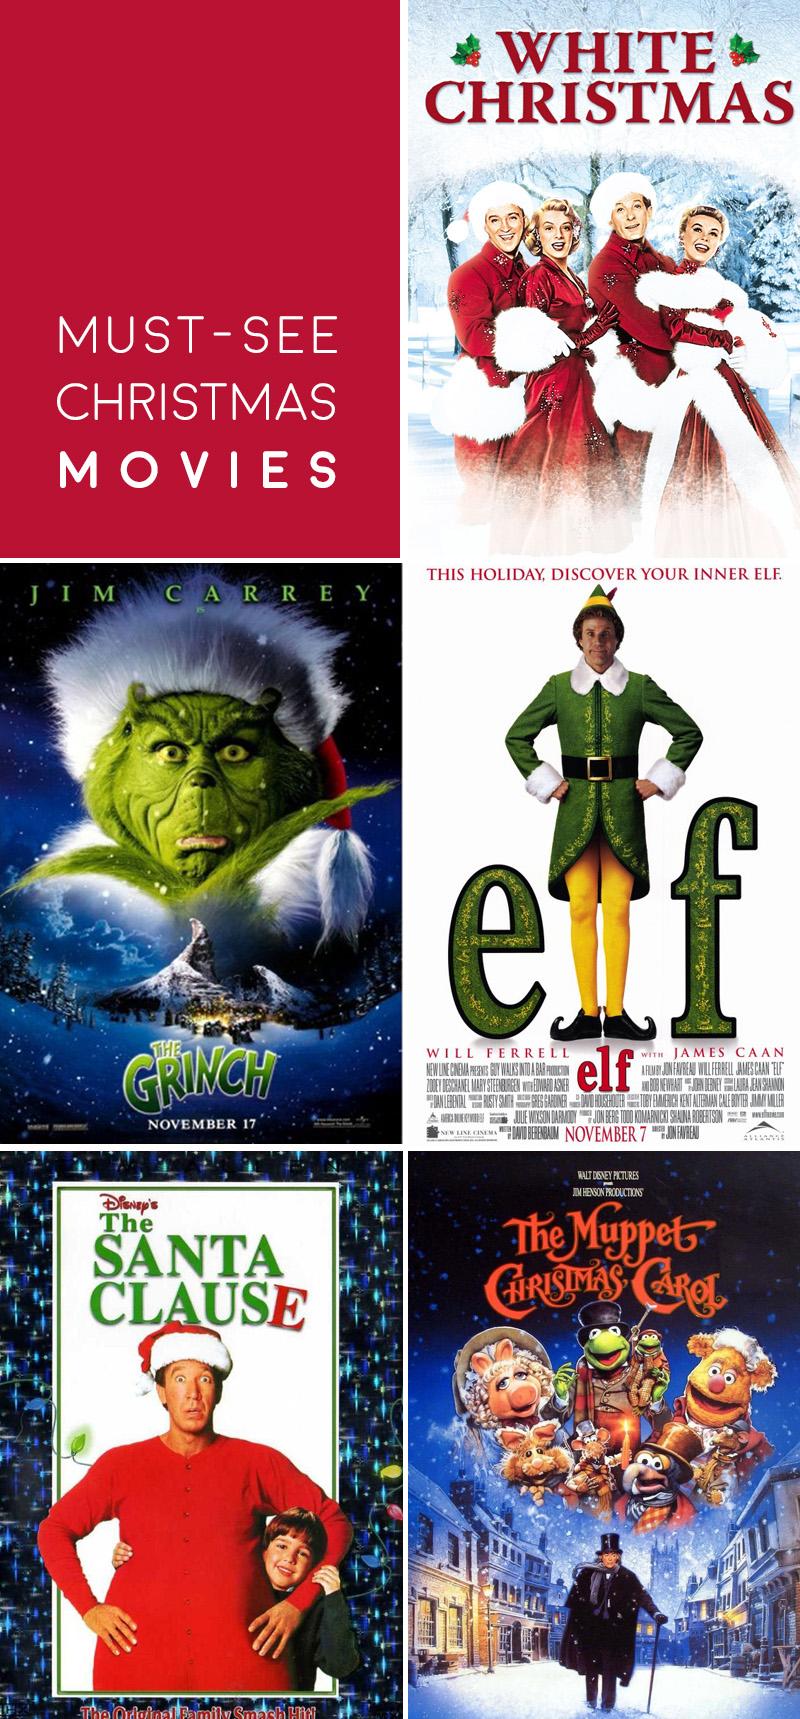 Top 5 Must-See Christmas Movies | ashleyjoanna.com